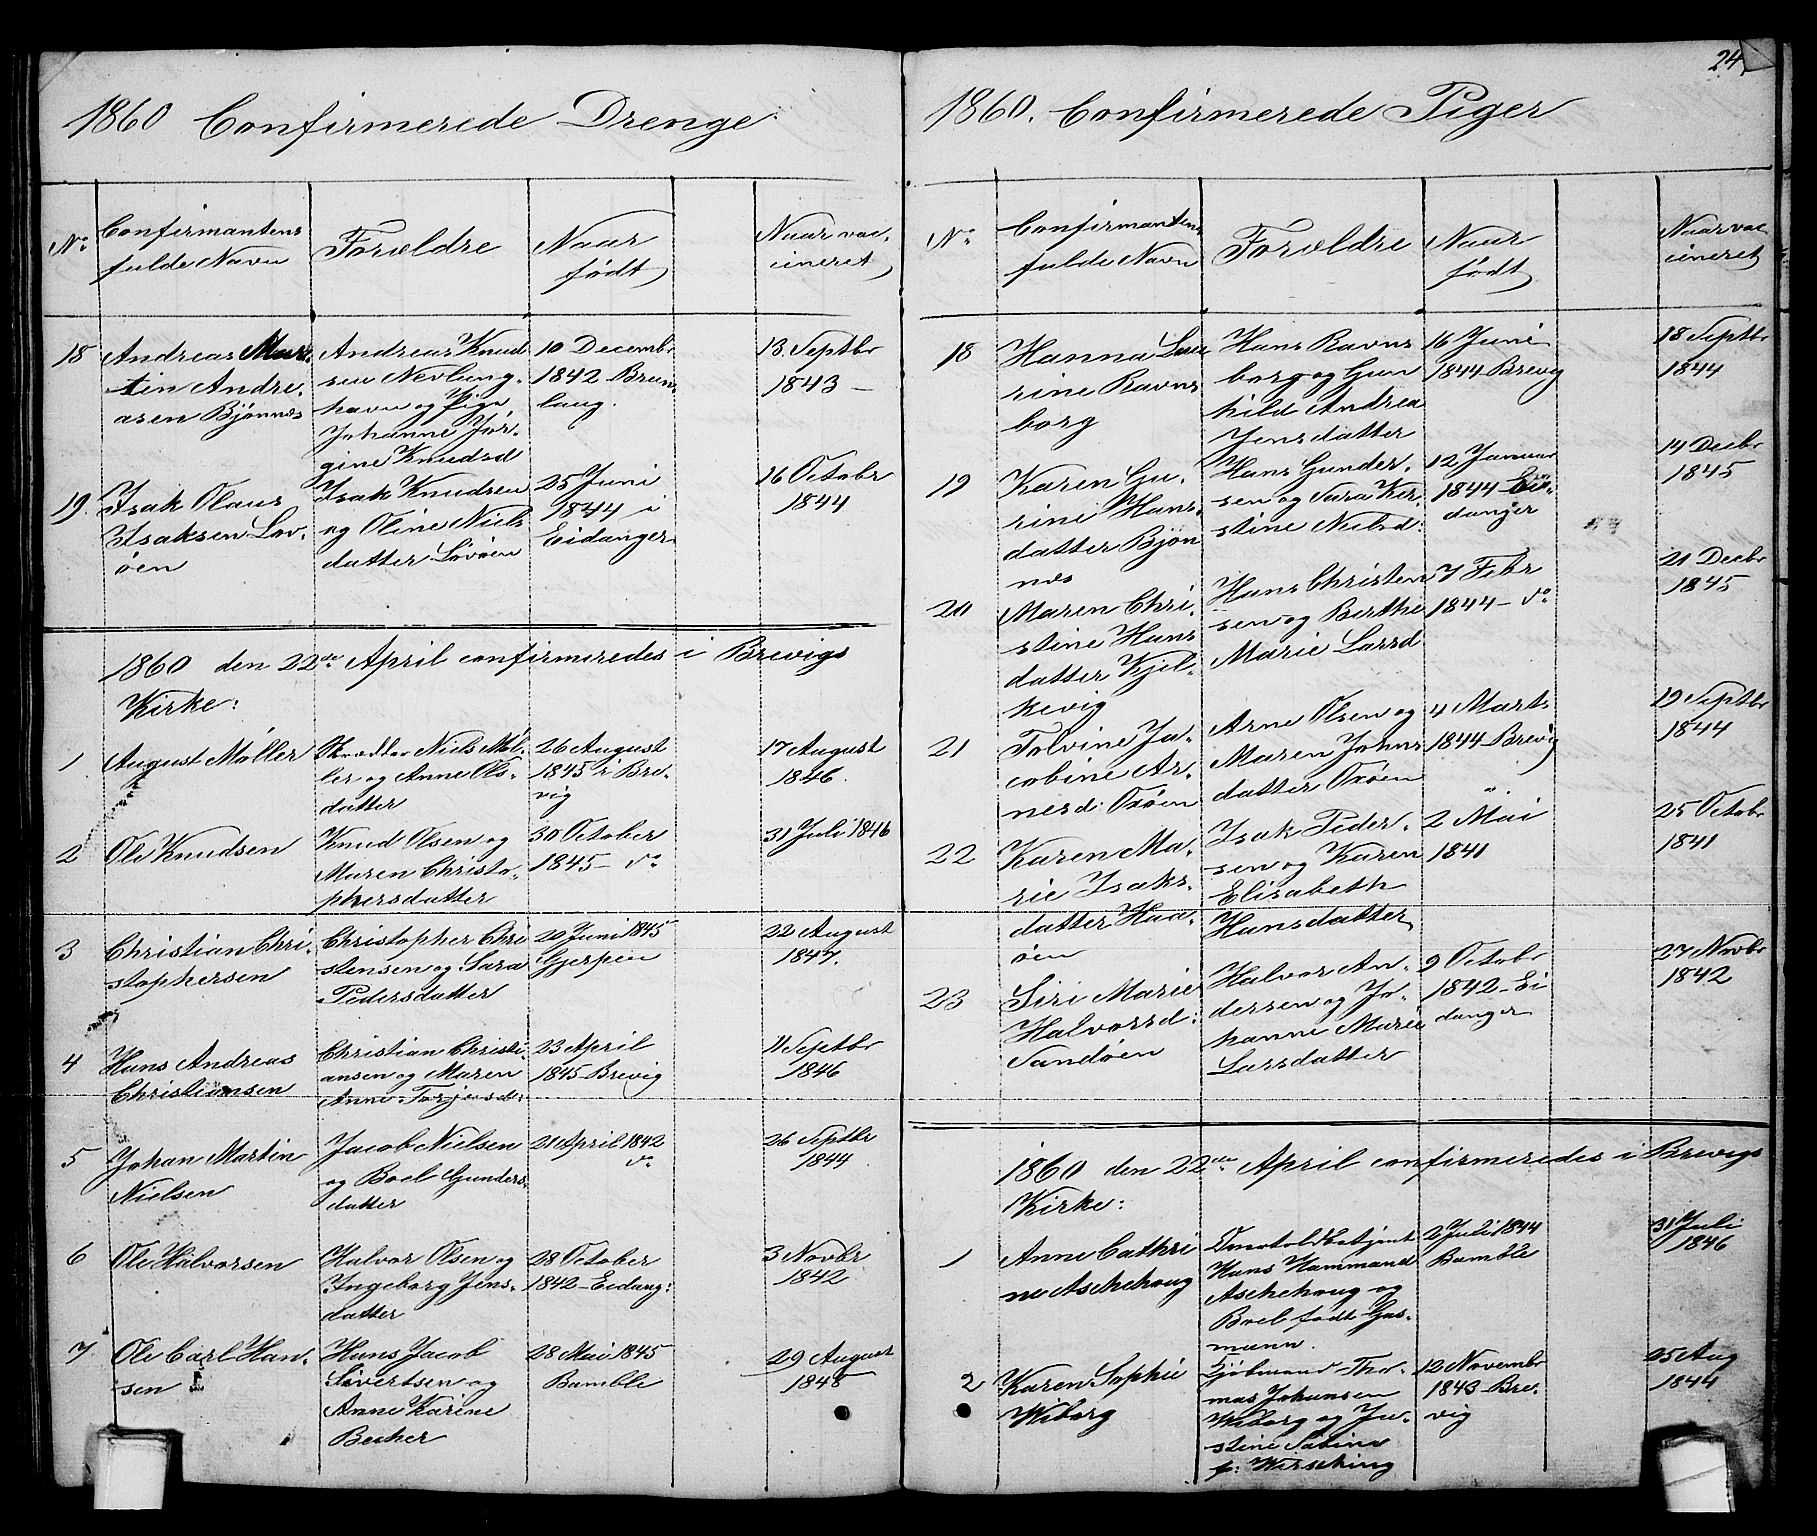 SAKO, Brevik kirkebøker, G/Ga/L0002: Klokkerbok nr. 2, 1846-1865, s. 249